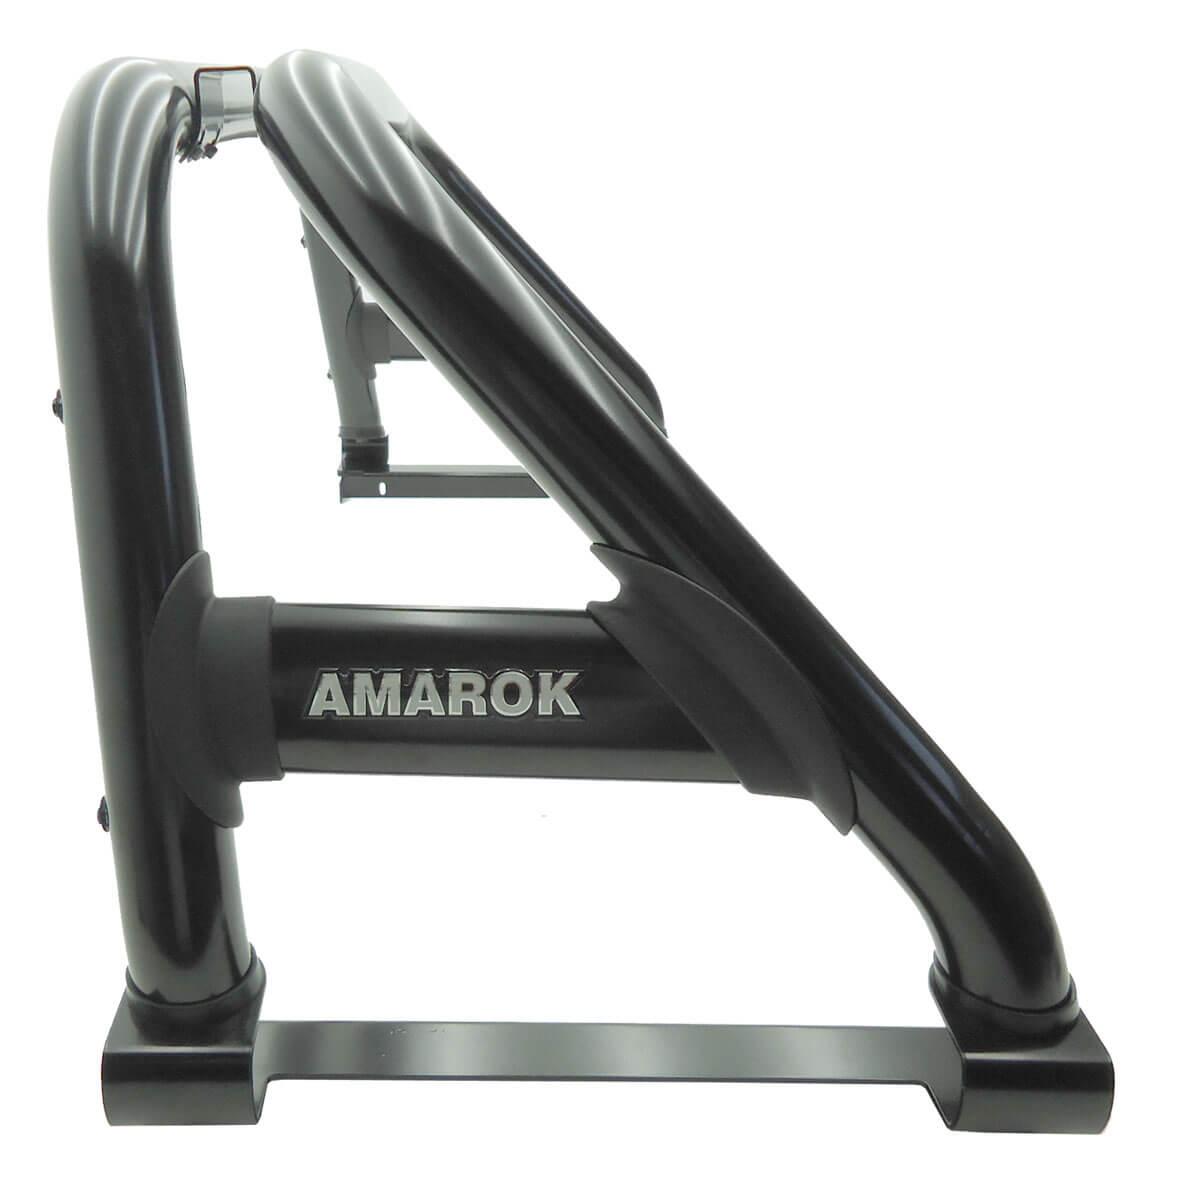 Santo antônio duplo preto Amarok 2011 a 2020